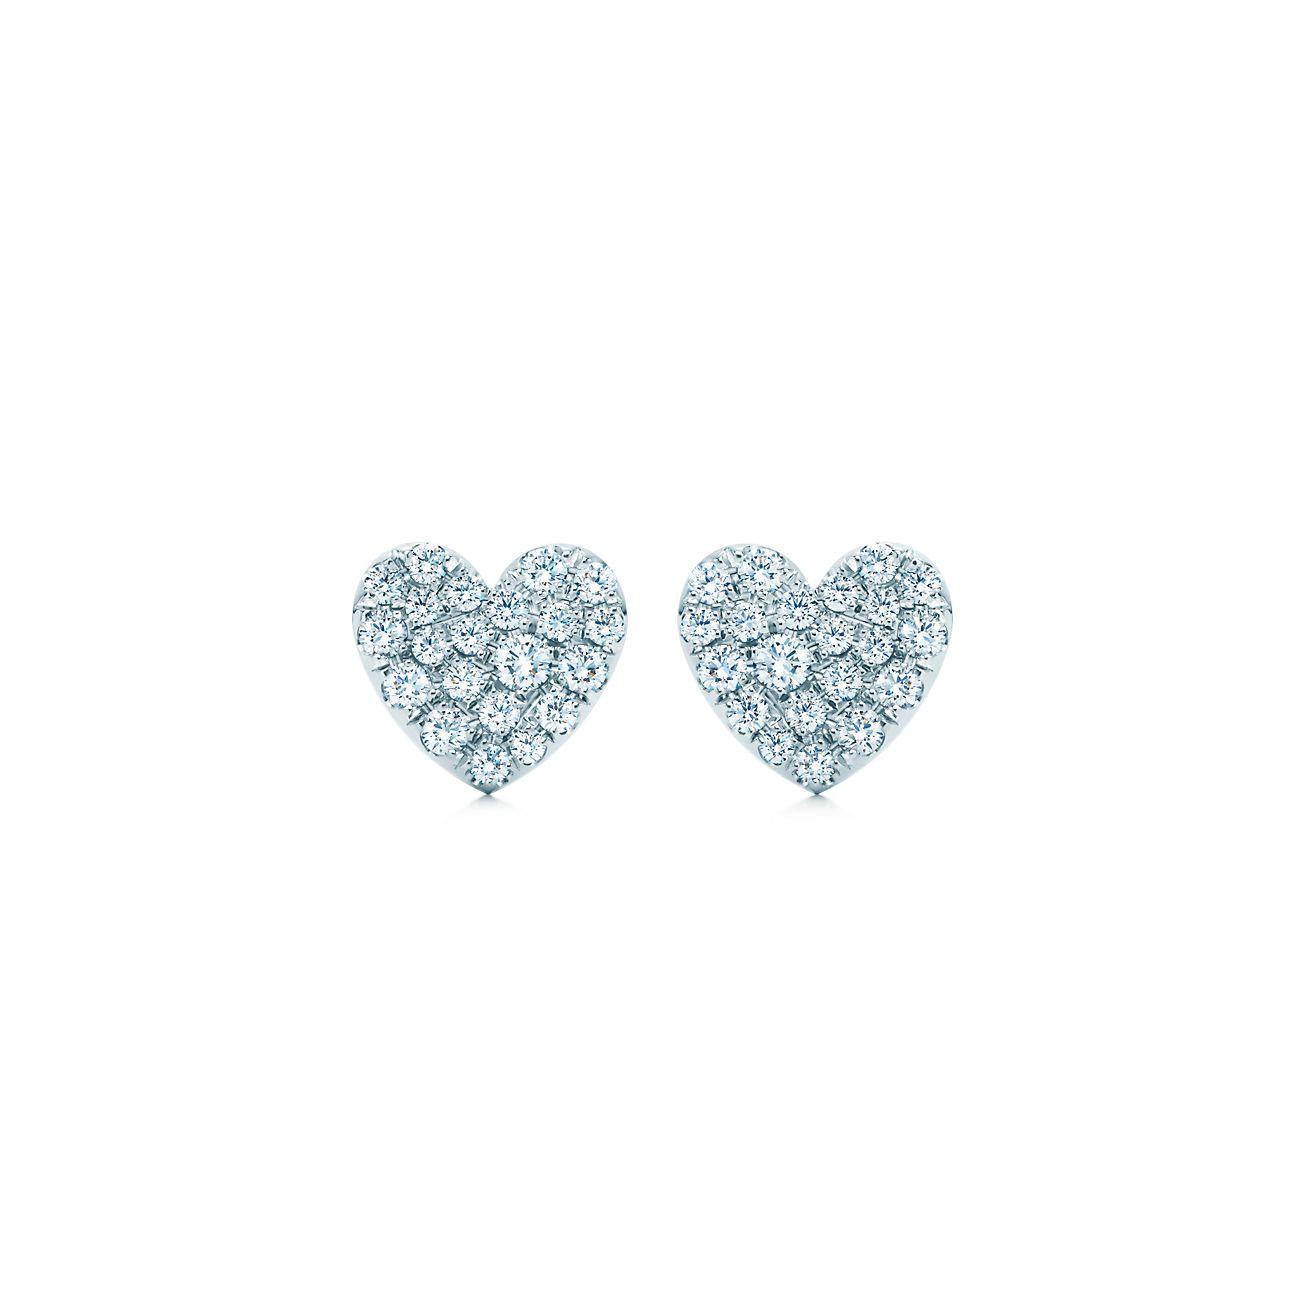 Diamond heart earrings - Heart Earrings Heart Earrings